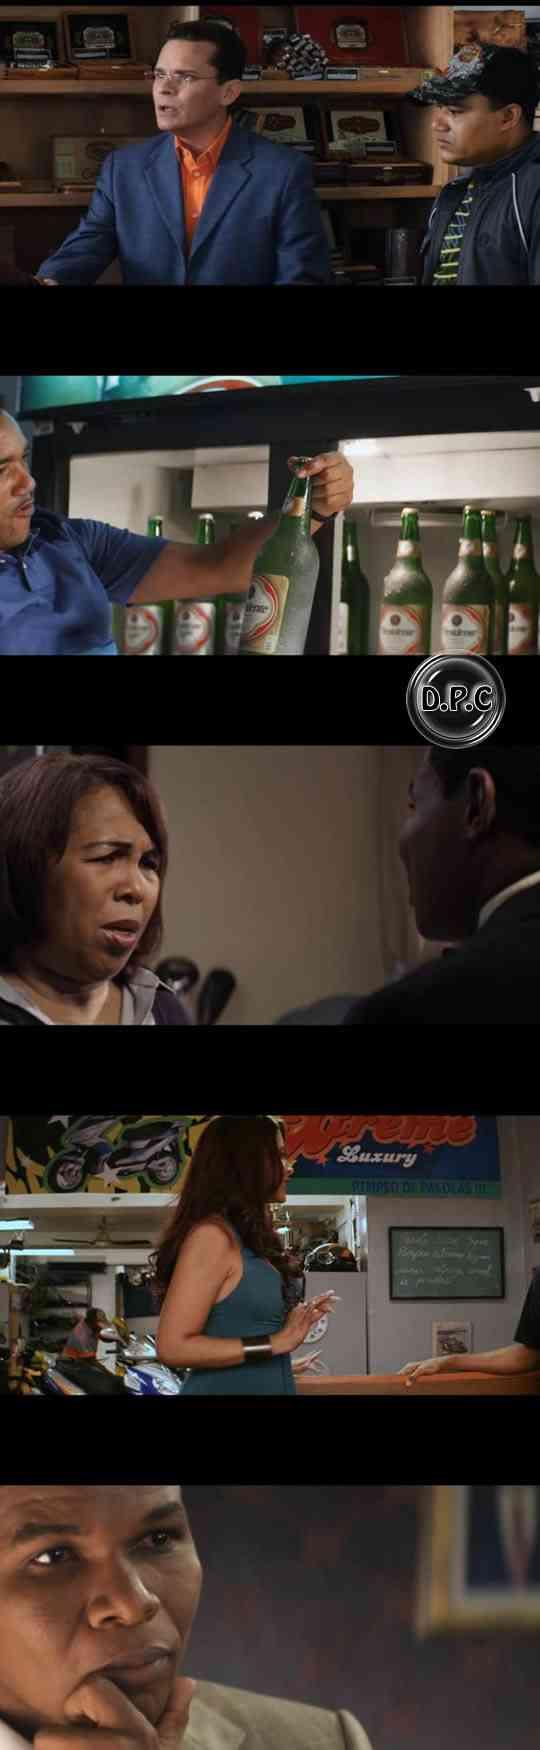 Lotoman.2011.DVDRip